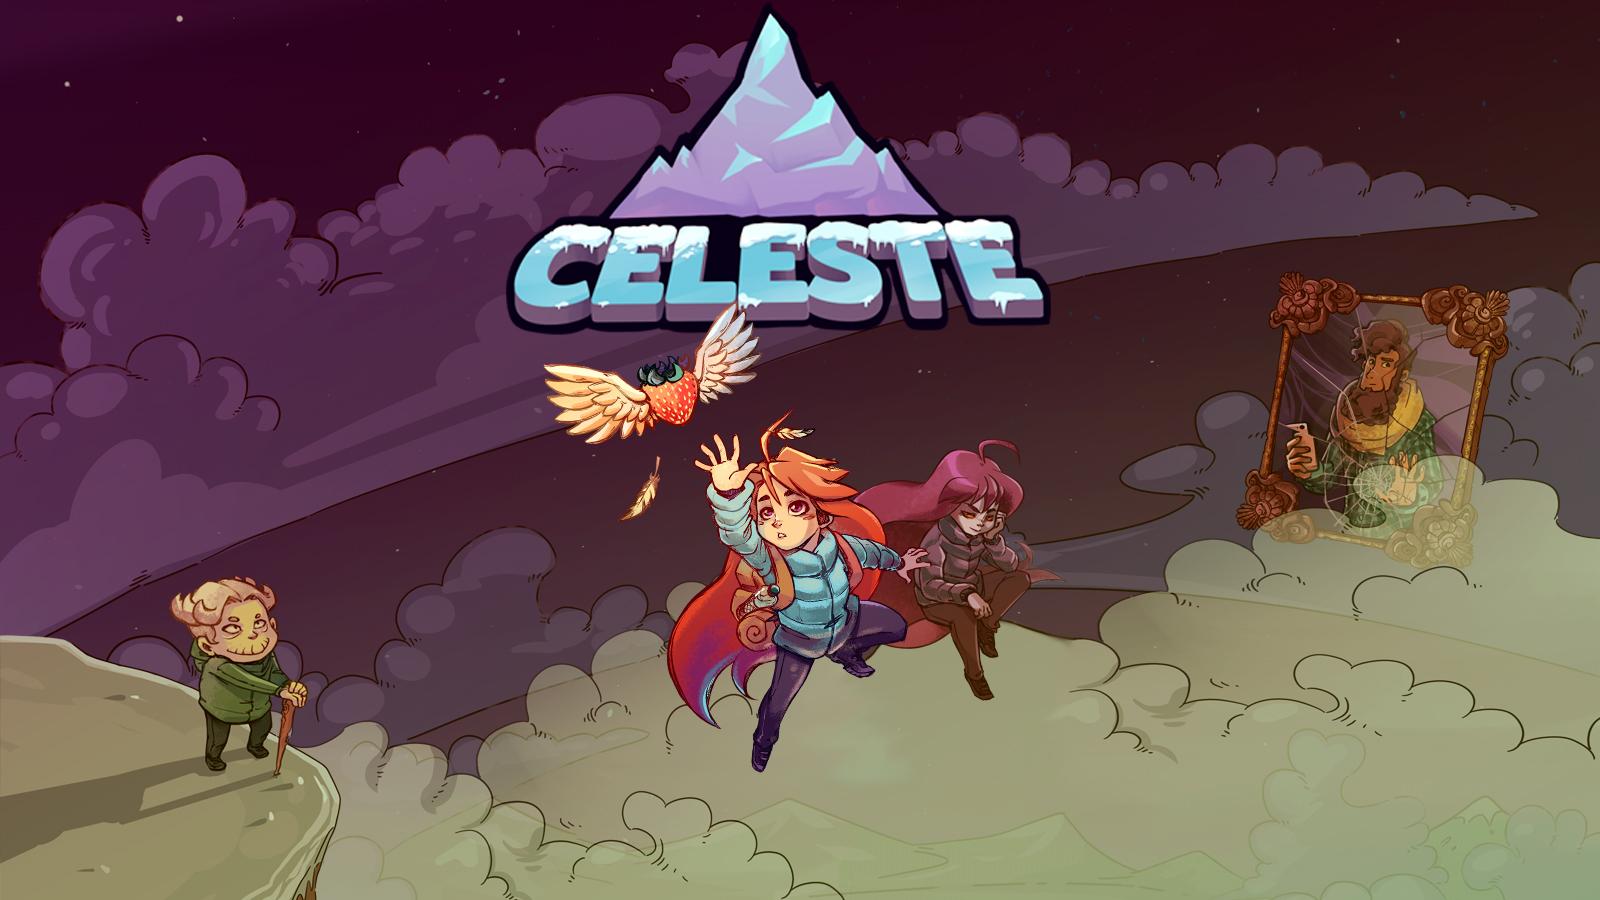 BlurryPhoenix Reflects: Celeste